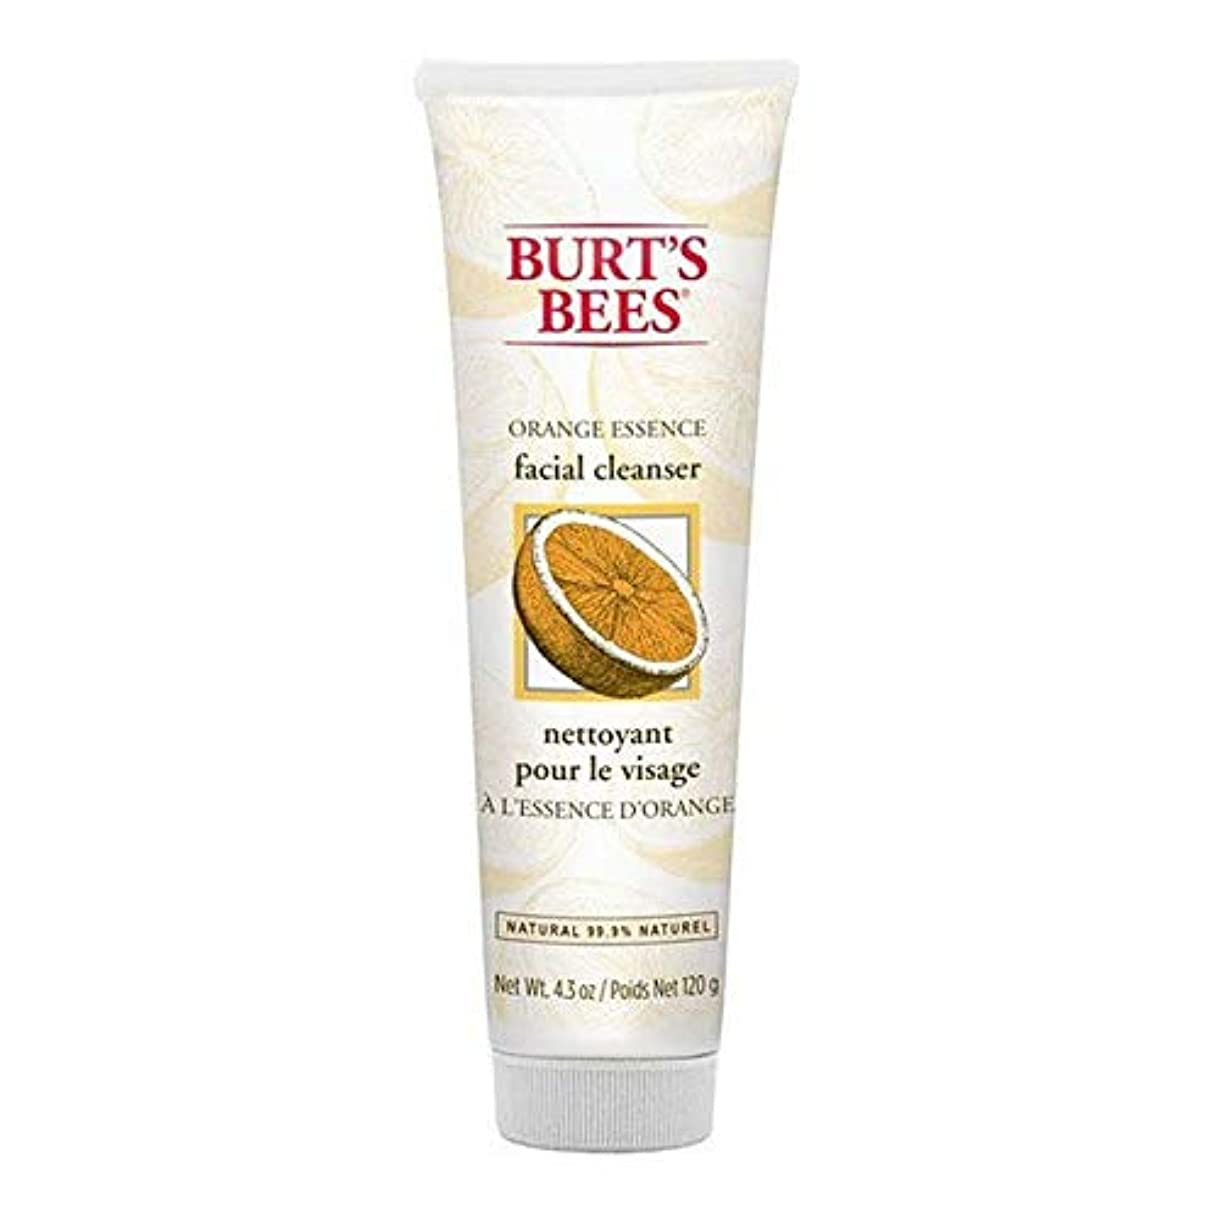 [Burt's Bees ] バーツビーオレンジエッセンス洗顔料の120グラム - Burt's Bees Orange Essence Facial Cleanser 120g [並行輸入品]